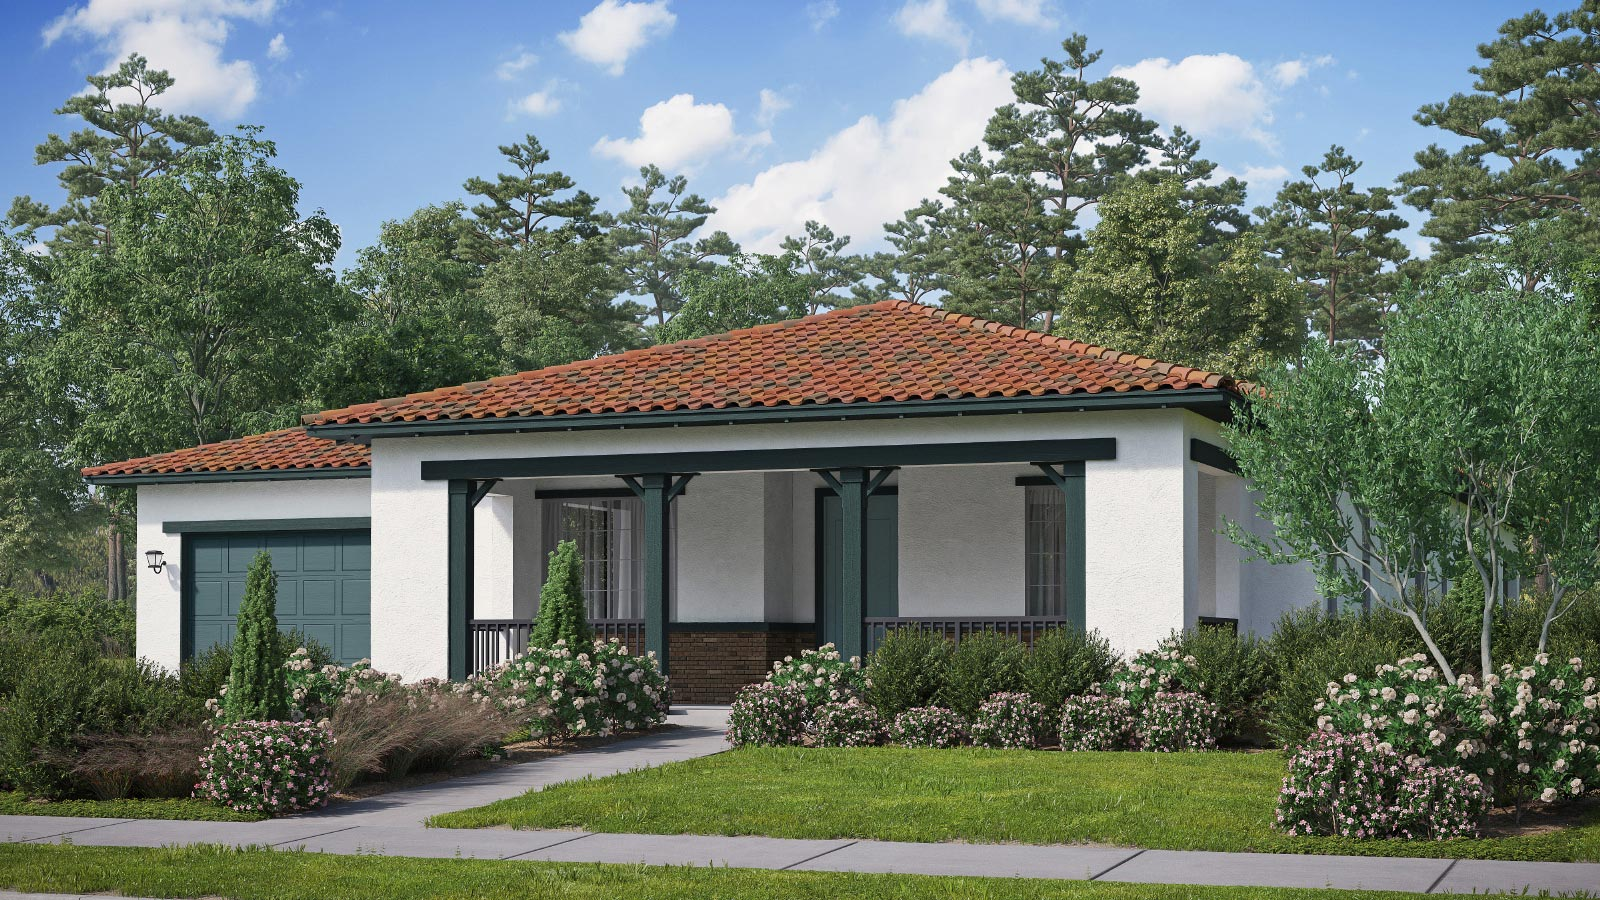 Residence 3B - Preliminary